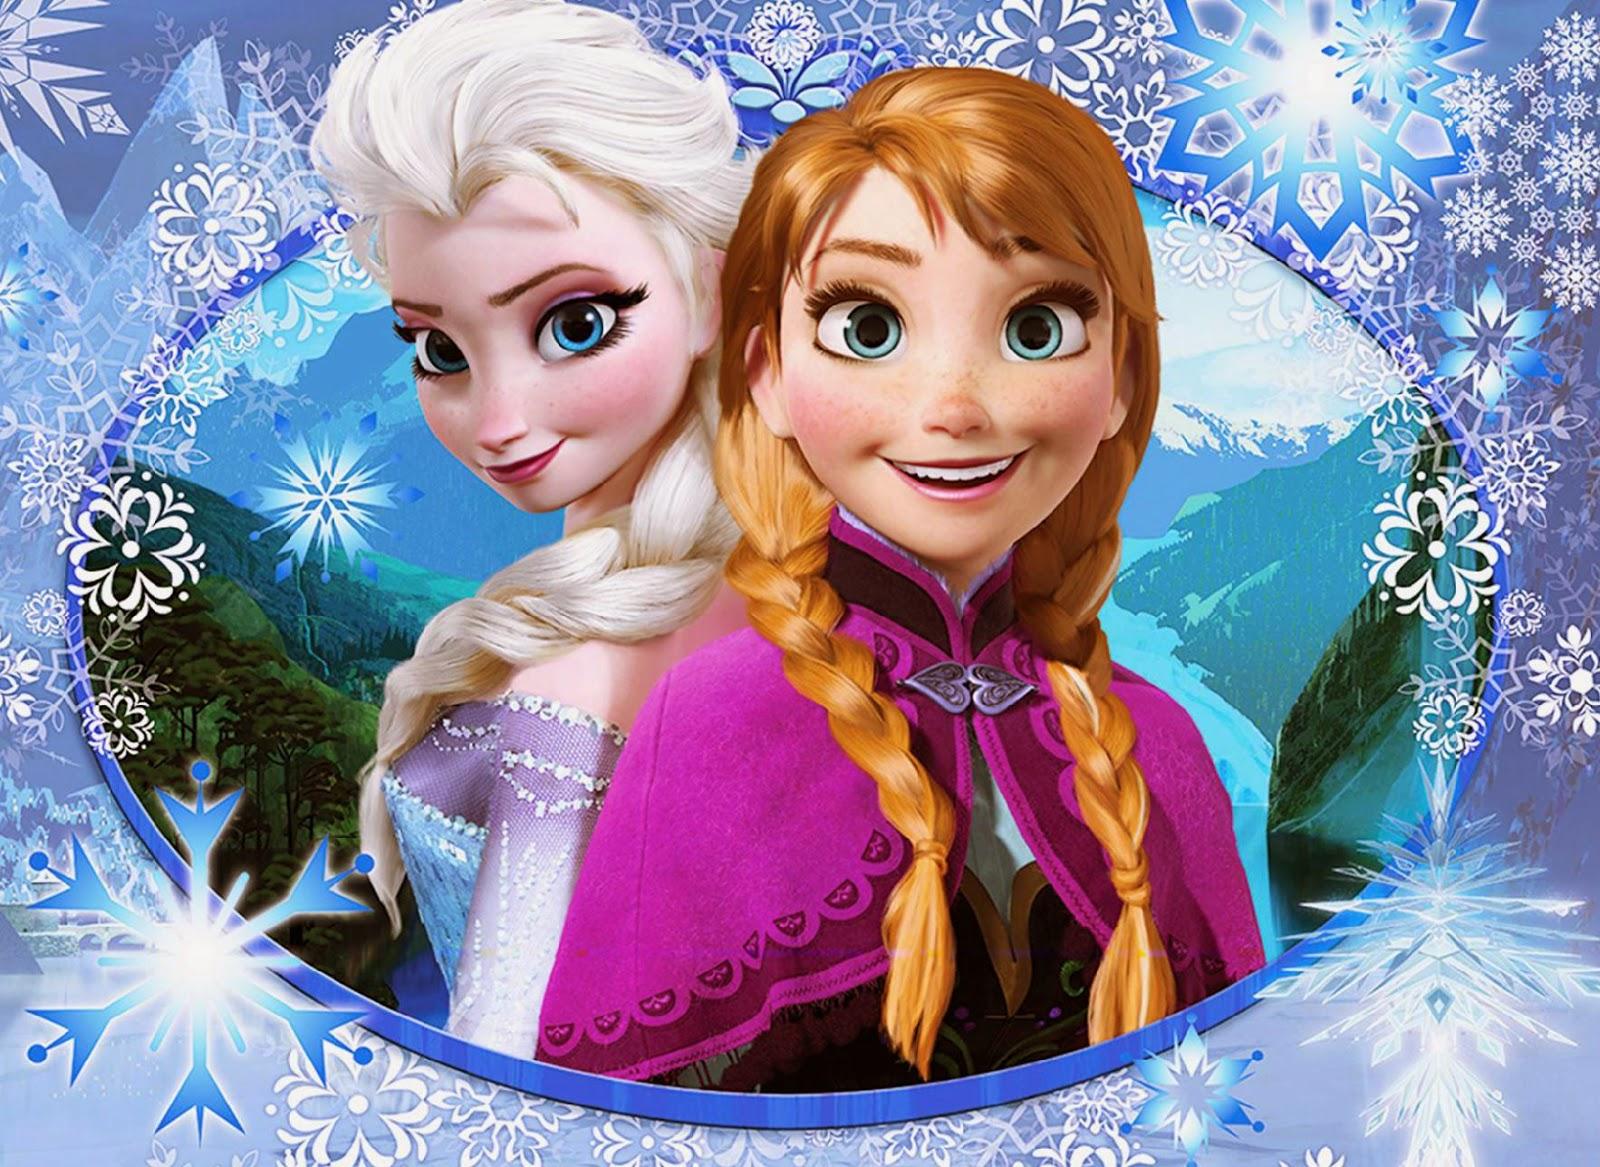 Elsa frozen hd wallpaper wallpapersafari - Fever wallpaper hd ...